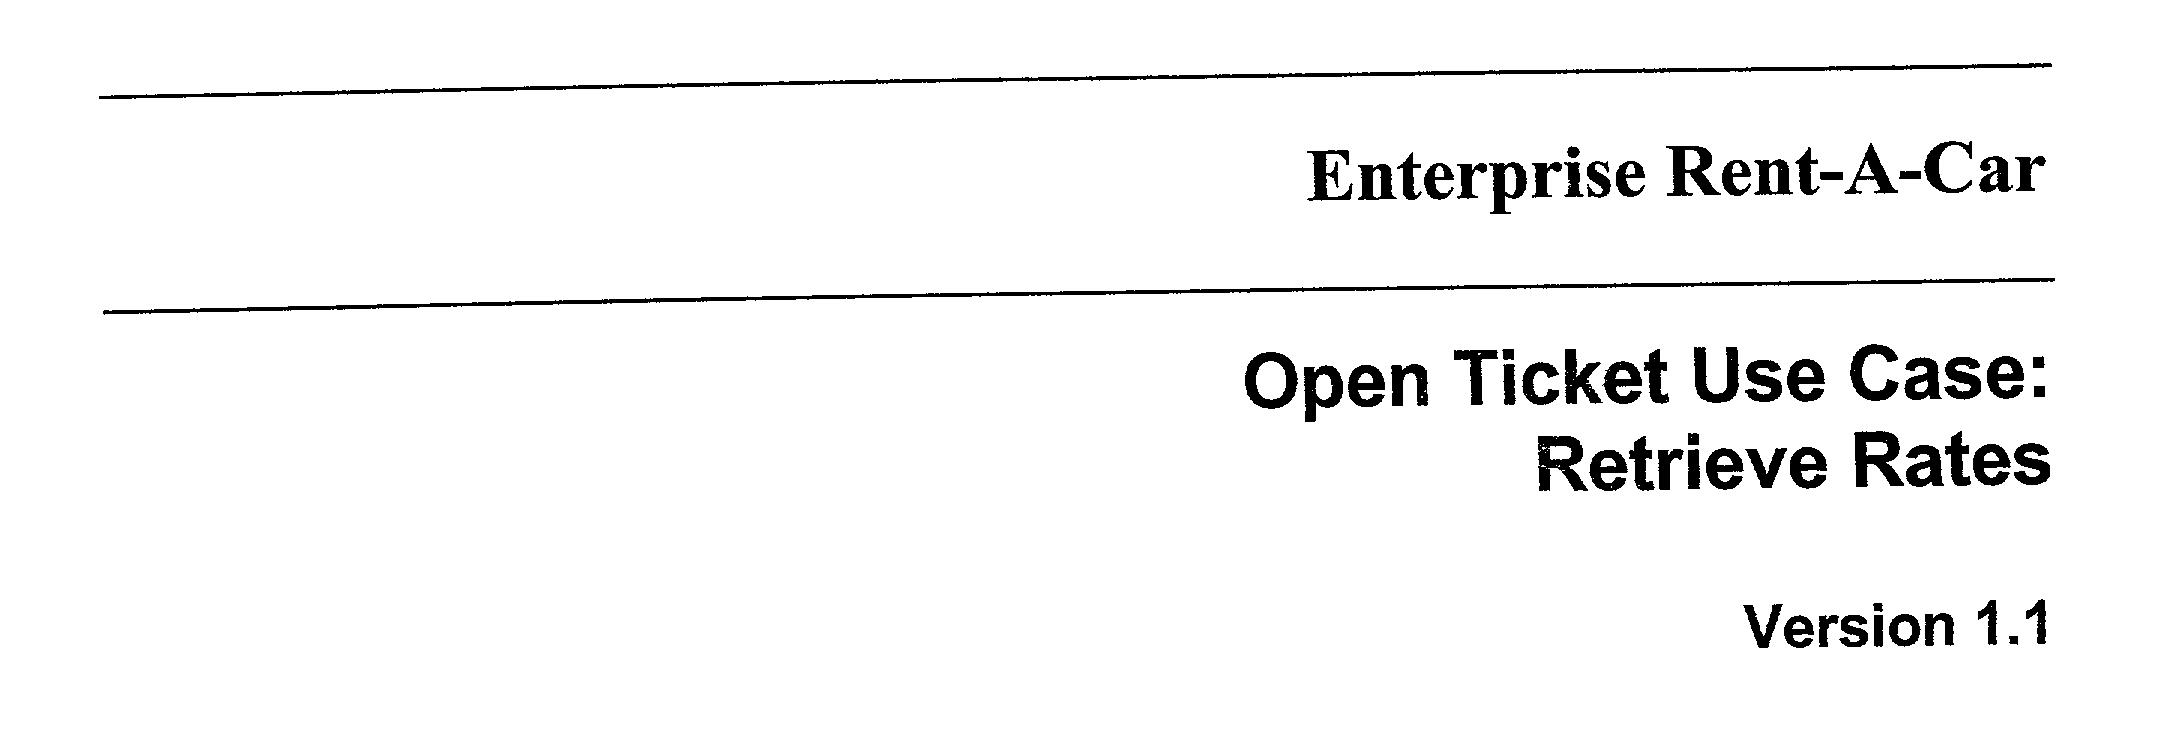 Figure US20030125992A1-20030703-P01887